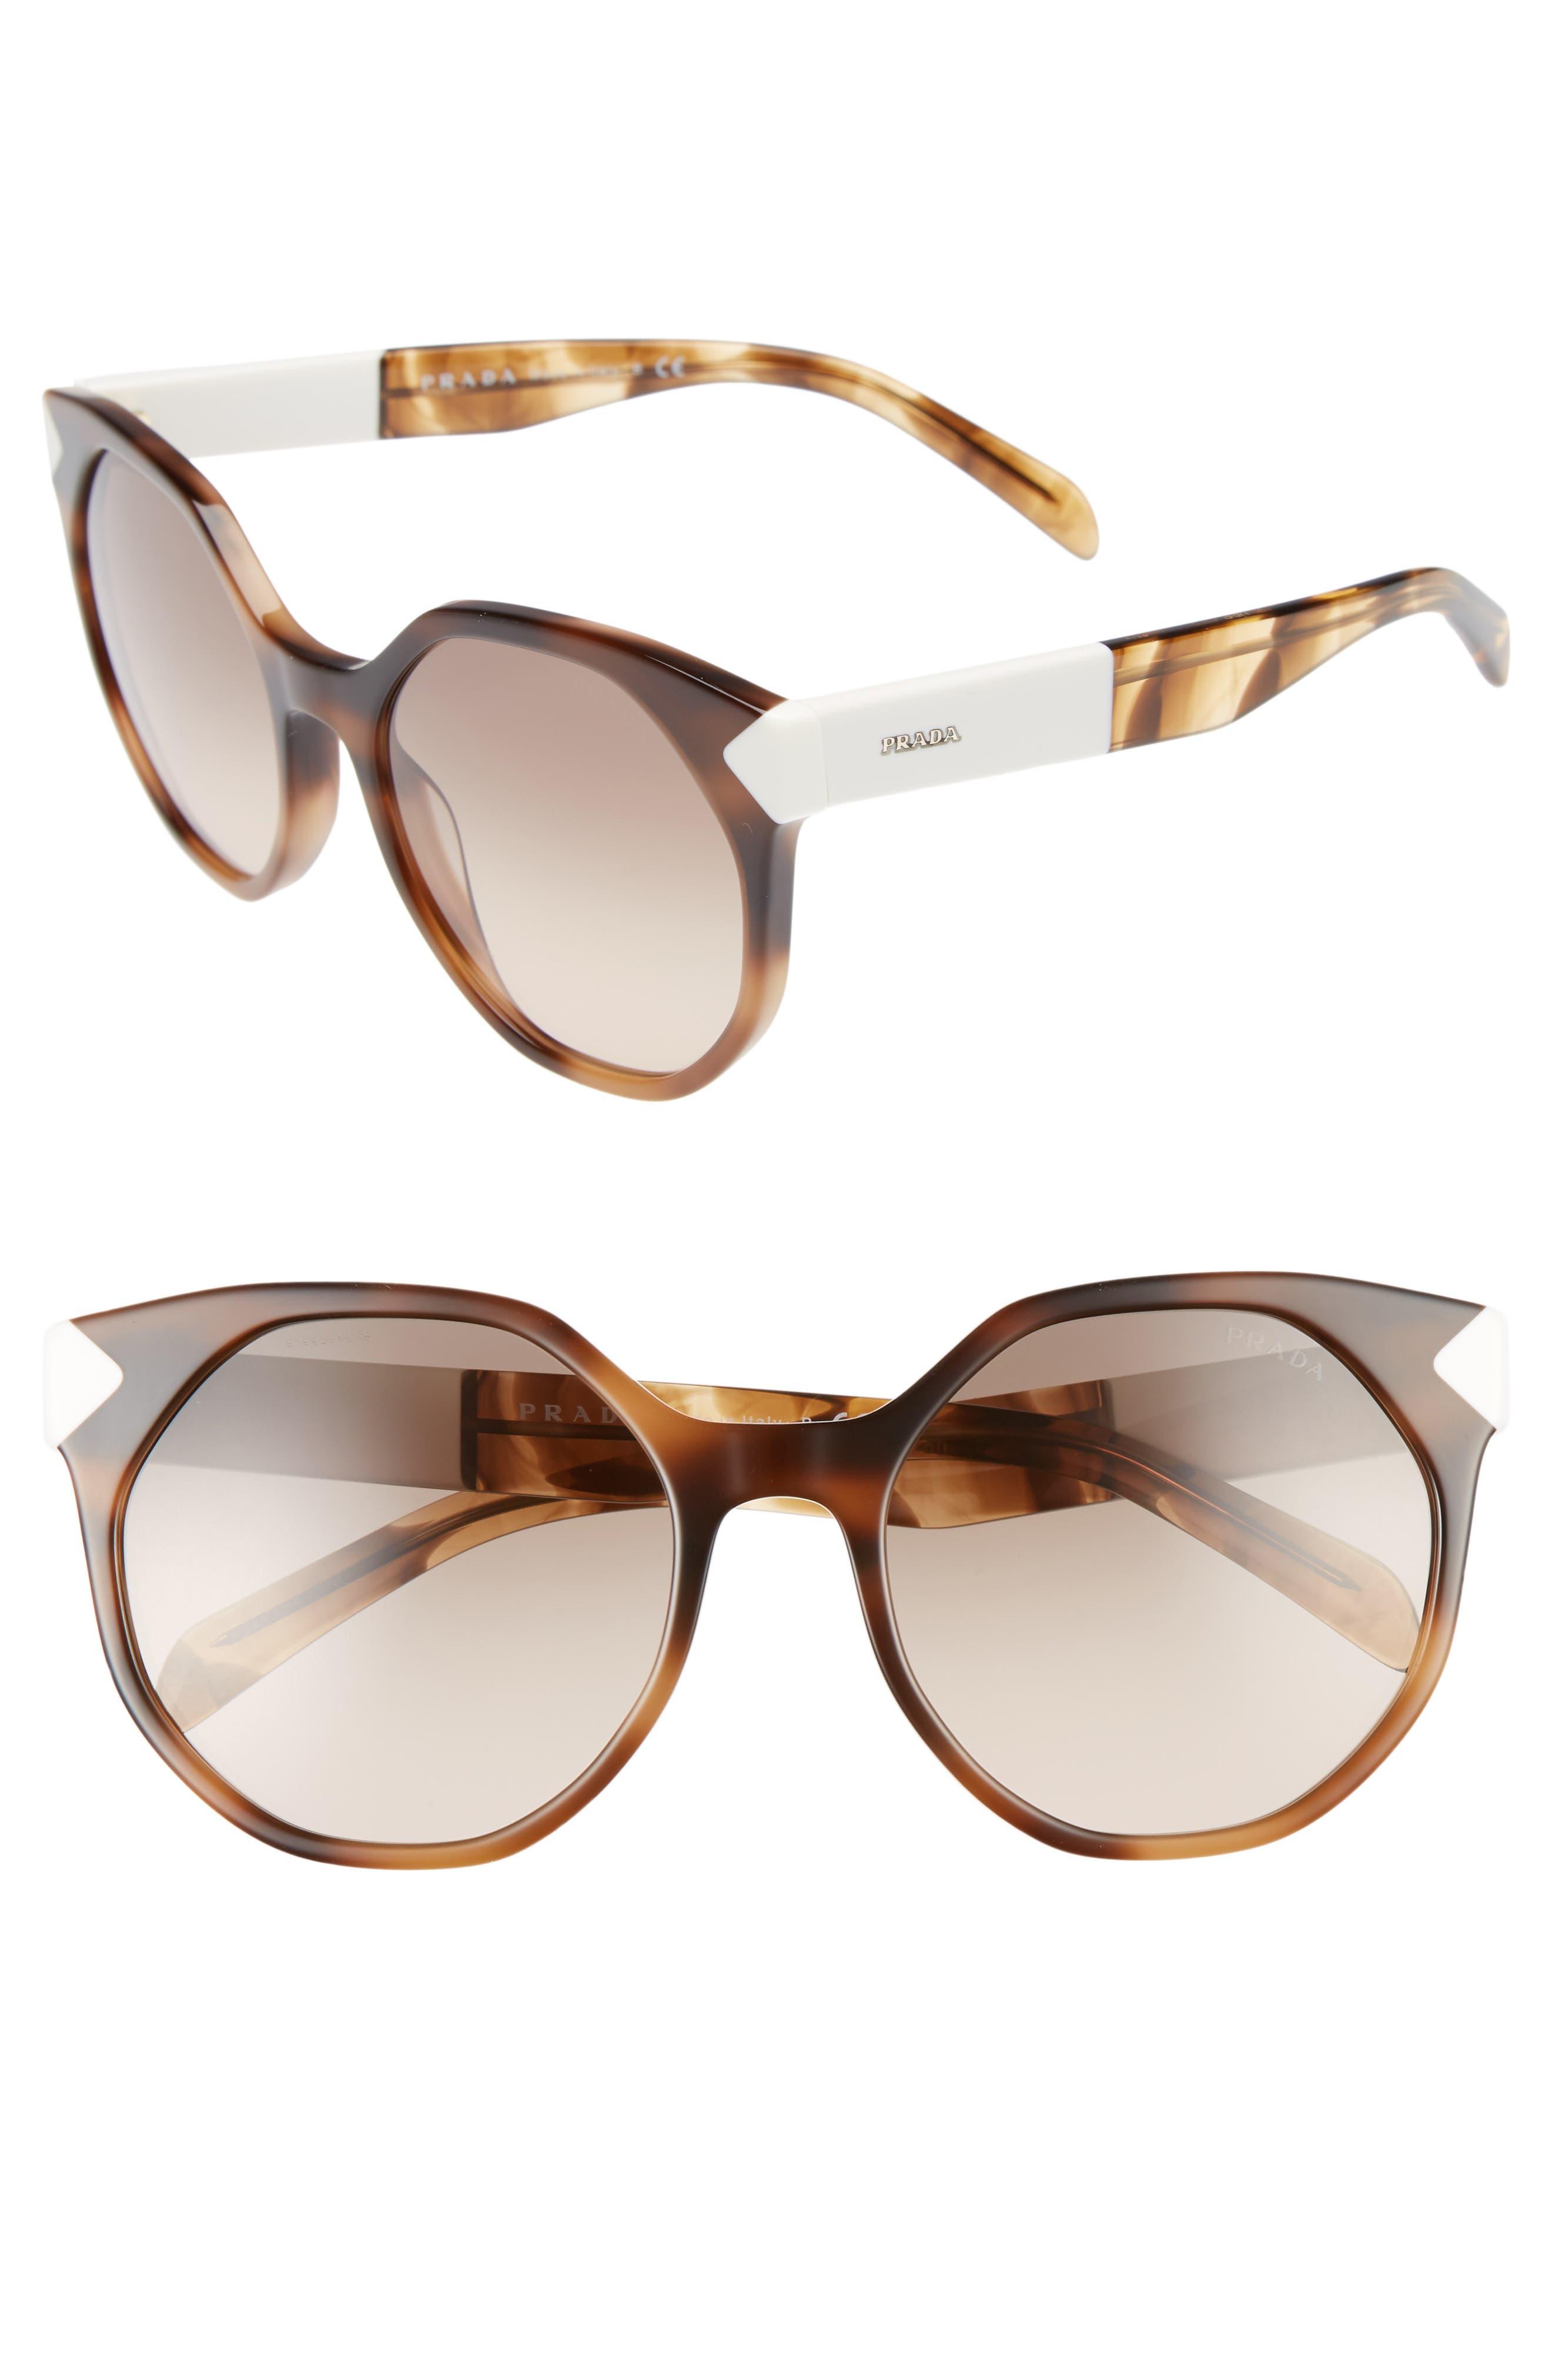 55mm Gradient Geometric Sunglasses,                             Main thumbnail 1, color,                             200